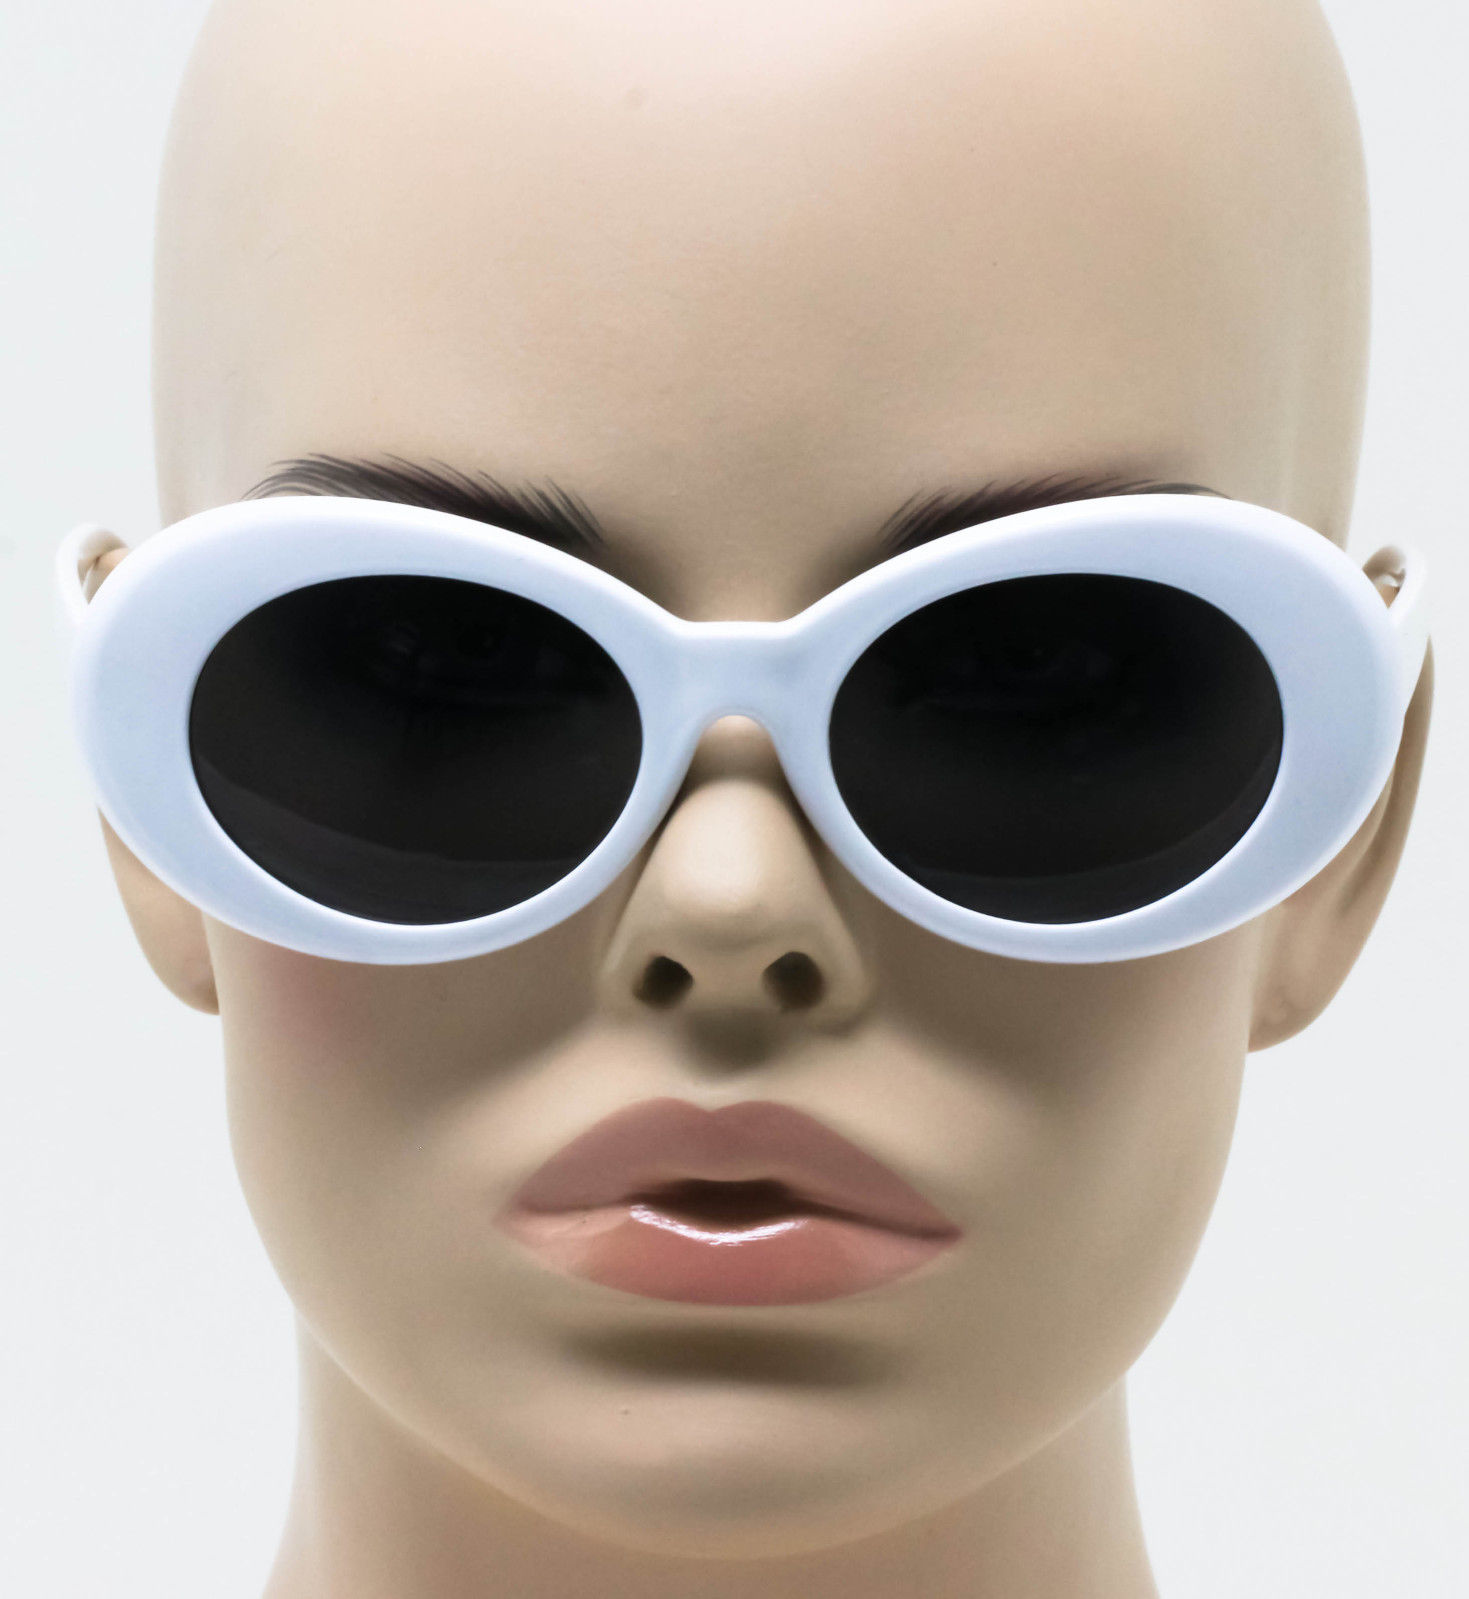 f05fb7dc03 Clout Goggles Clout Rapper Hypebeast Cool Oval Migos Yachty Glasses Kurt  Cobain - Walmart.com